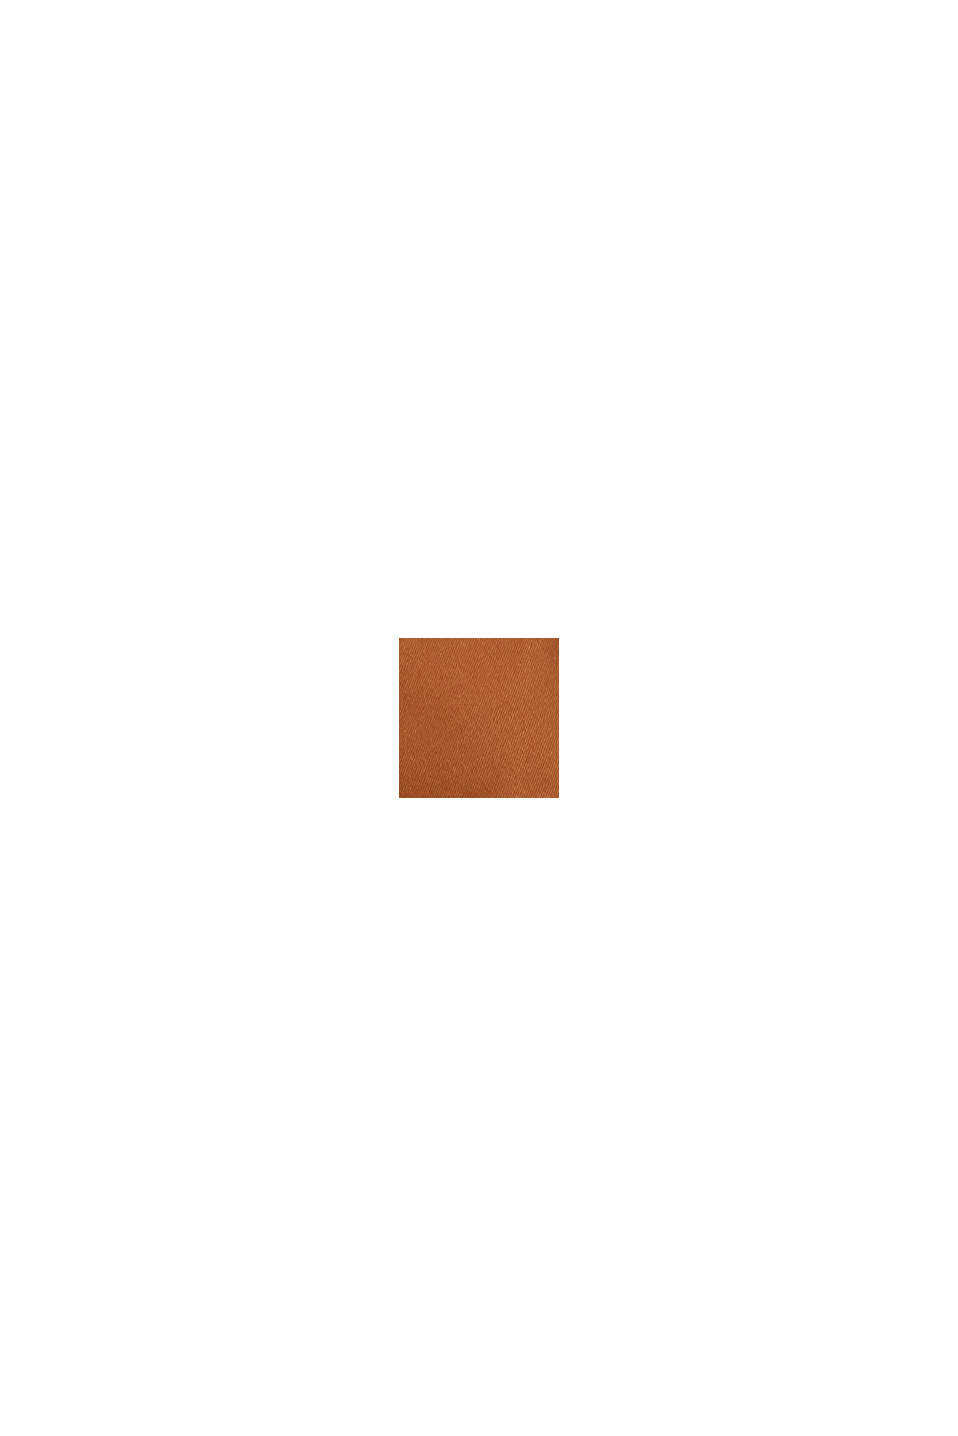 Lässiger Trenchcoat aus Lyocell-Mix, TOFFEE, swatch